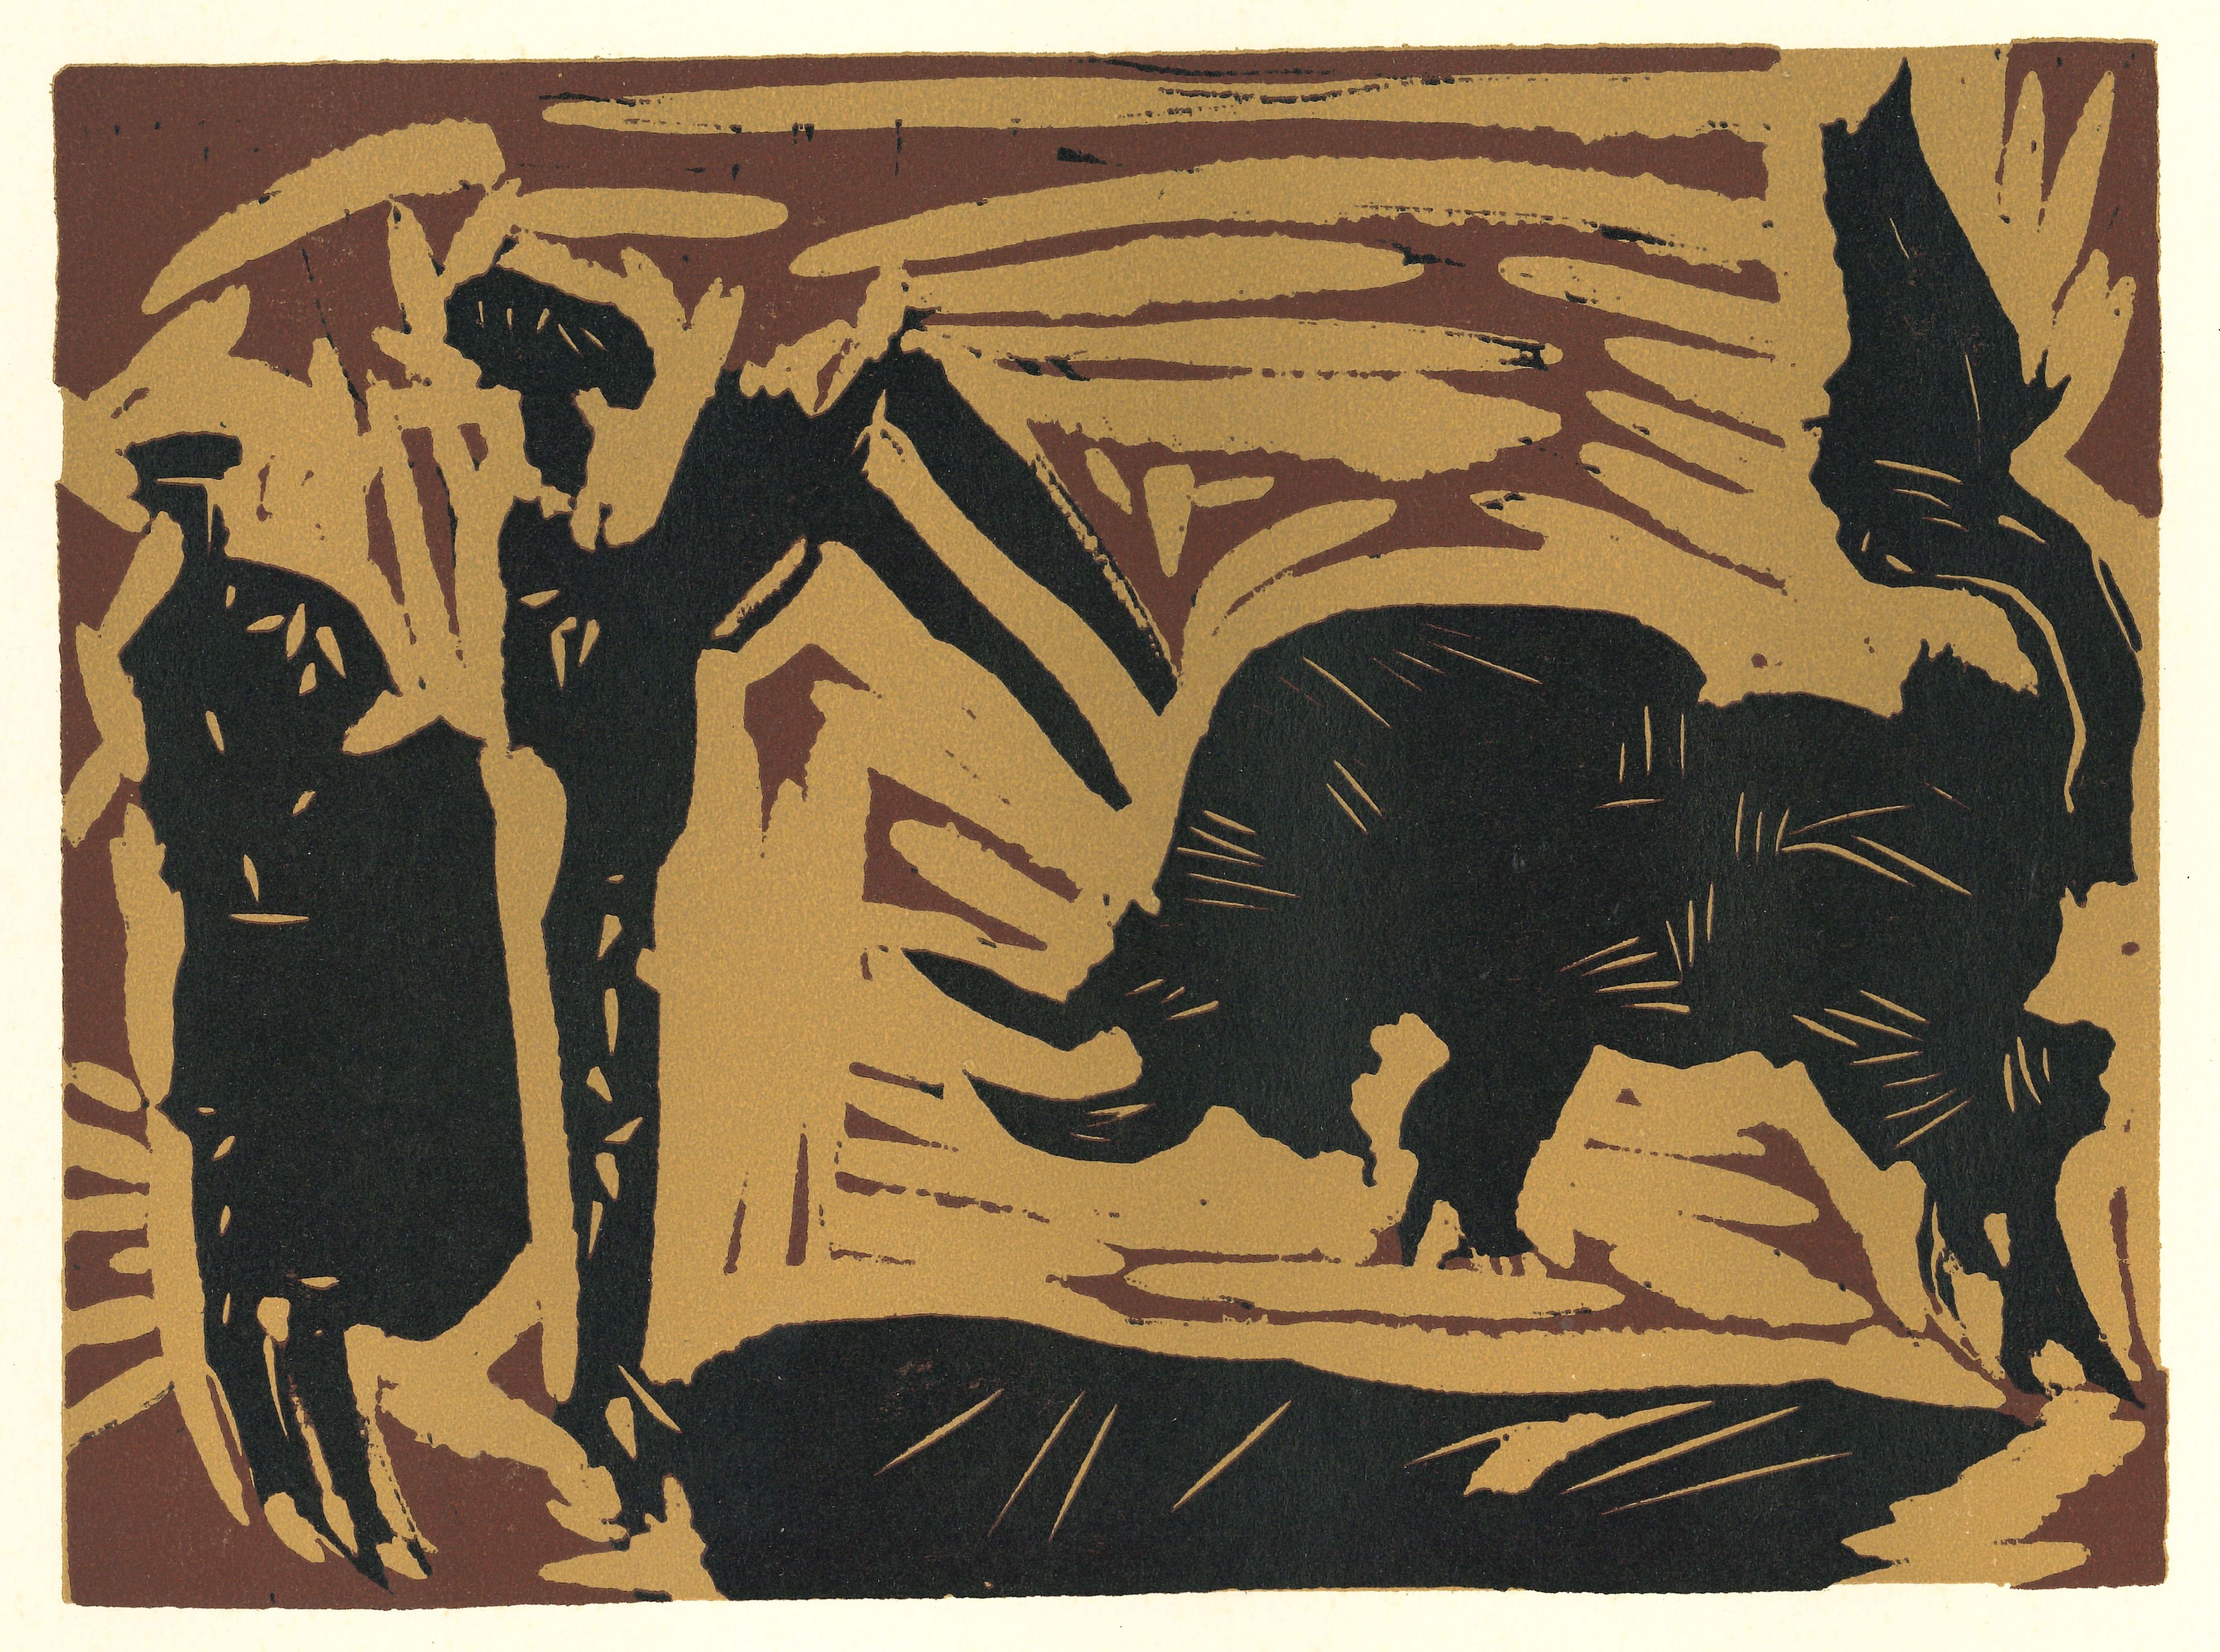 Banderilles   - Original Linocut After Pablo Picasso - 1962